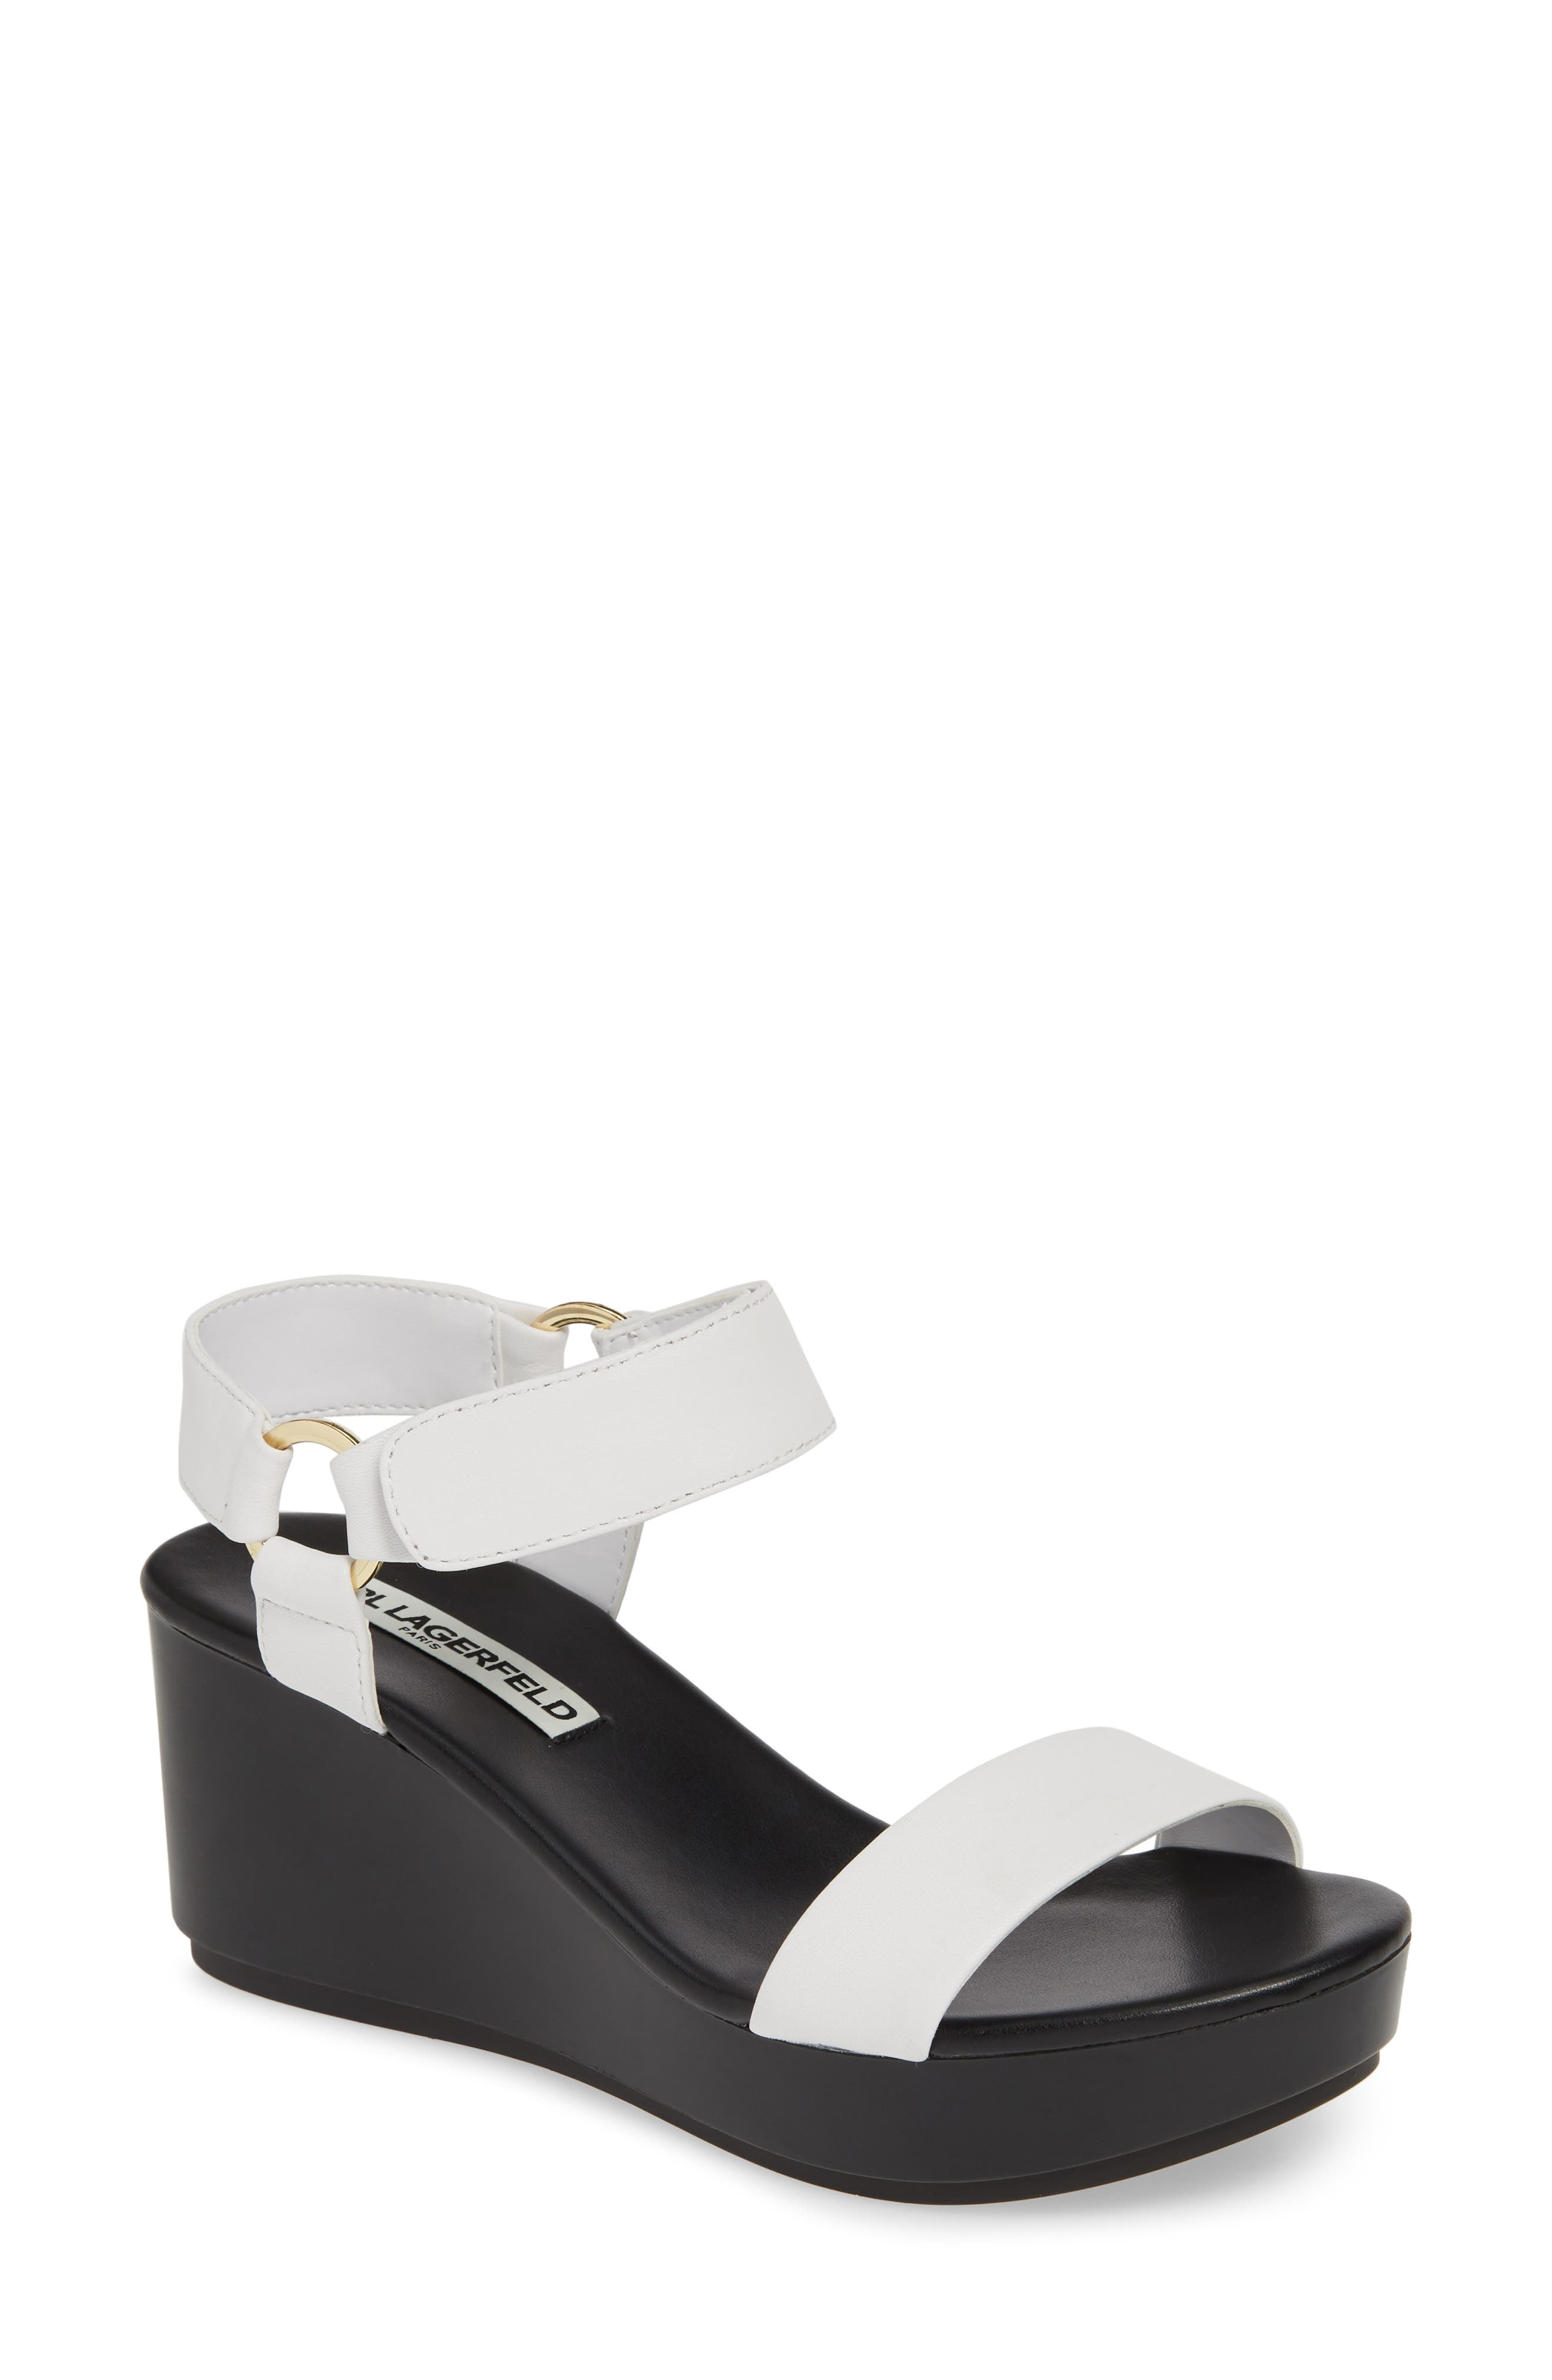 Karl Lagerfeld Paris Lana Platform Sandal, White